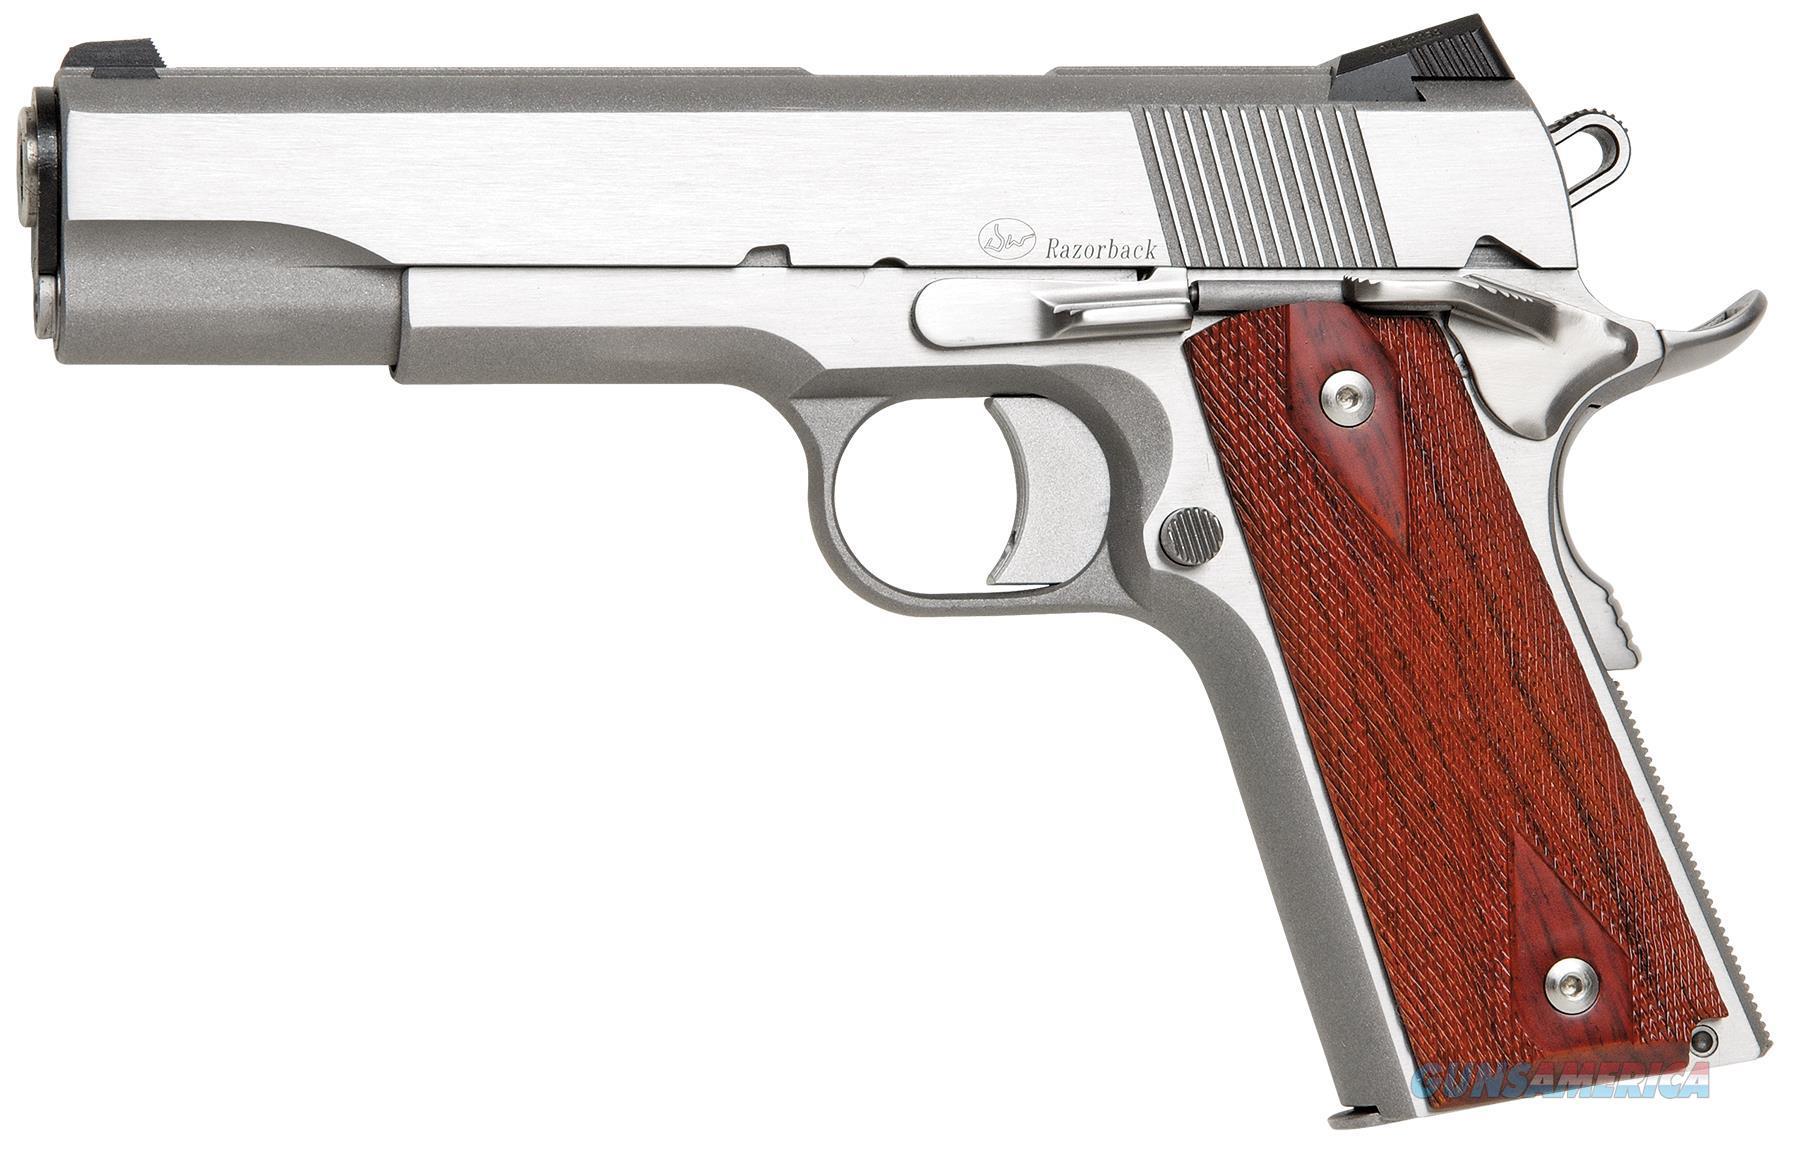 "Dan Wesson 01907 Dw Razorback Rz-10 Sao 10Mm 5"" 9+1 Fs Cocobolo Grip Ss 01907  Guns > Pistols > C Misc Pistols"